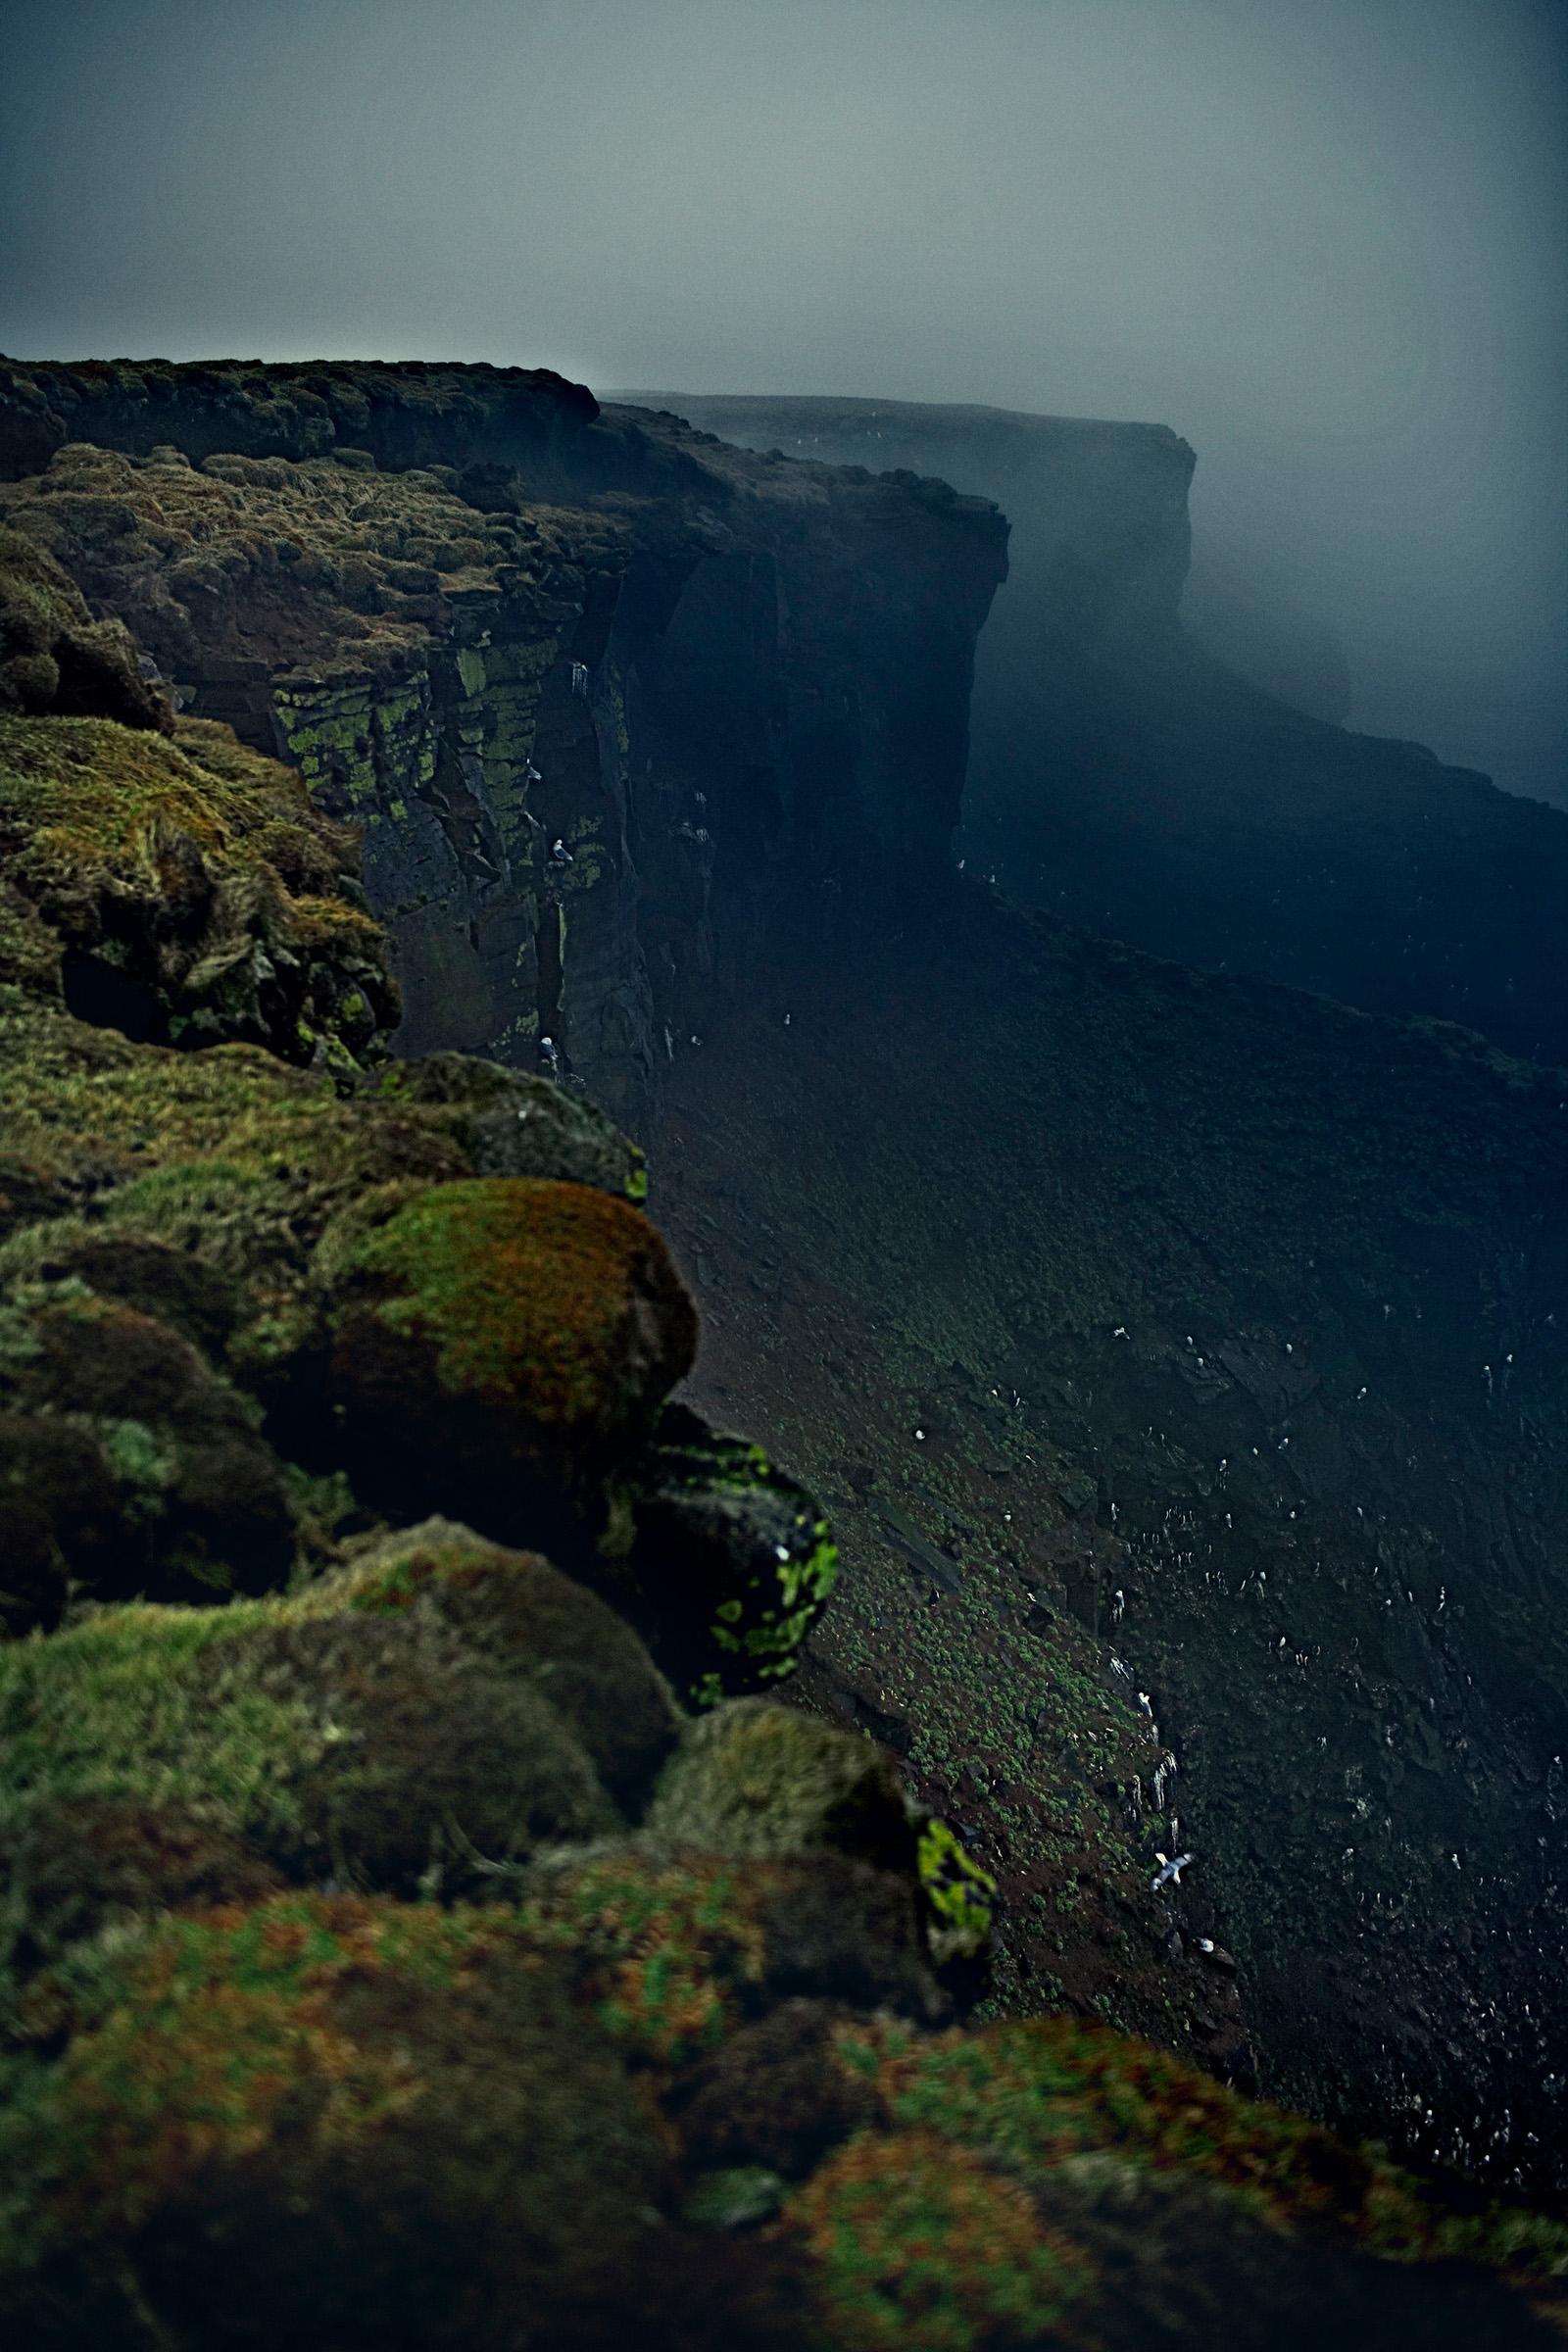 218807-11227736-Iceland_Day06-02-001944_jpg.jpg